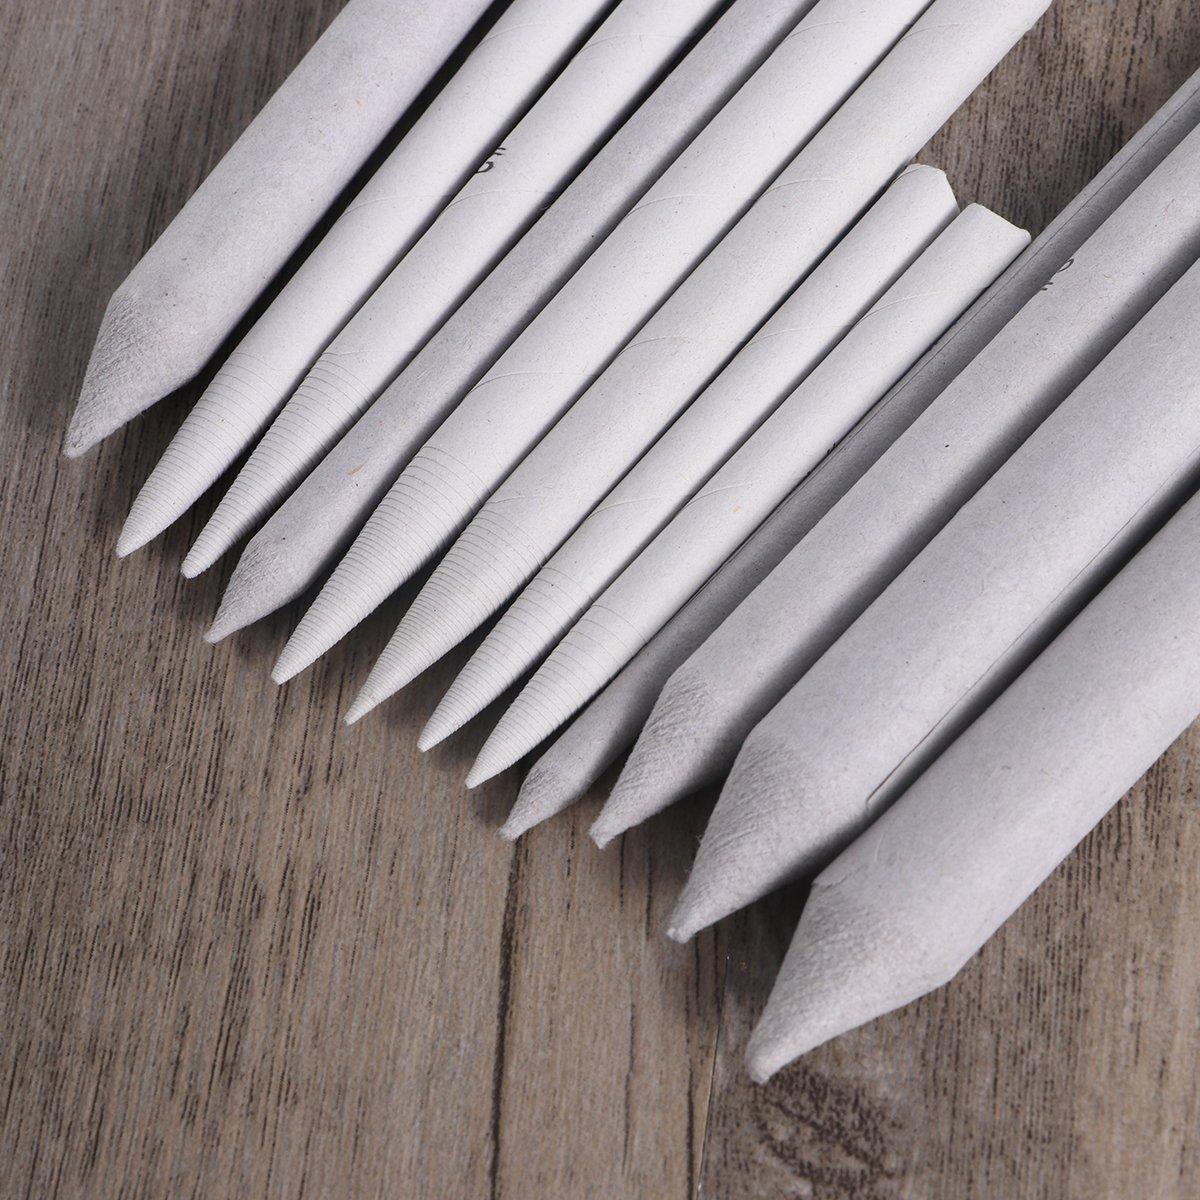 2 Pcs Sandpaper Pencil Sharpener Susuntas 21pcs Paper Blending Stumps and Tortillions Set Art Blenders One Pencil Extension Tool Art Blenders Drawing Accessories Set for Student Sketch Drawing